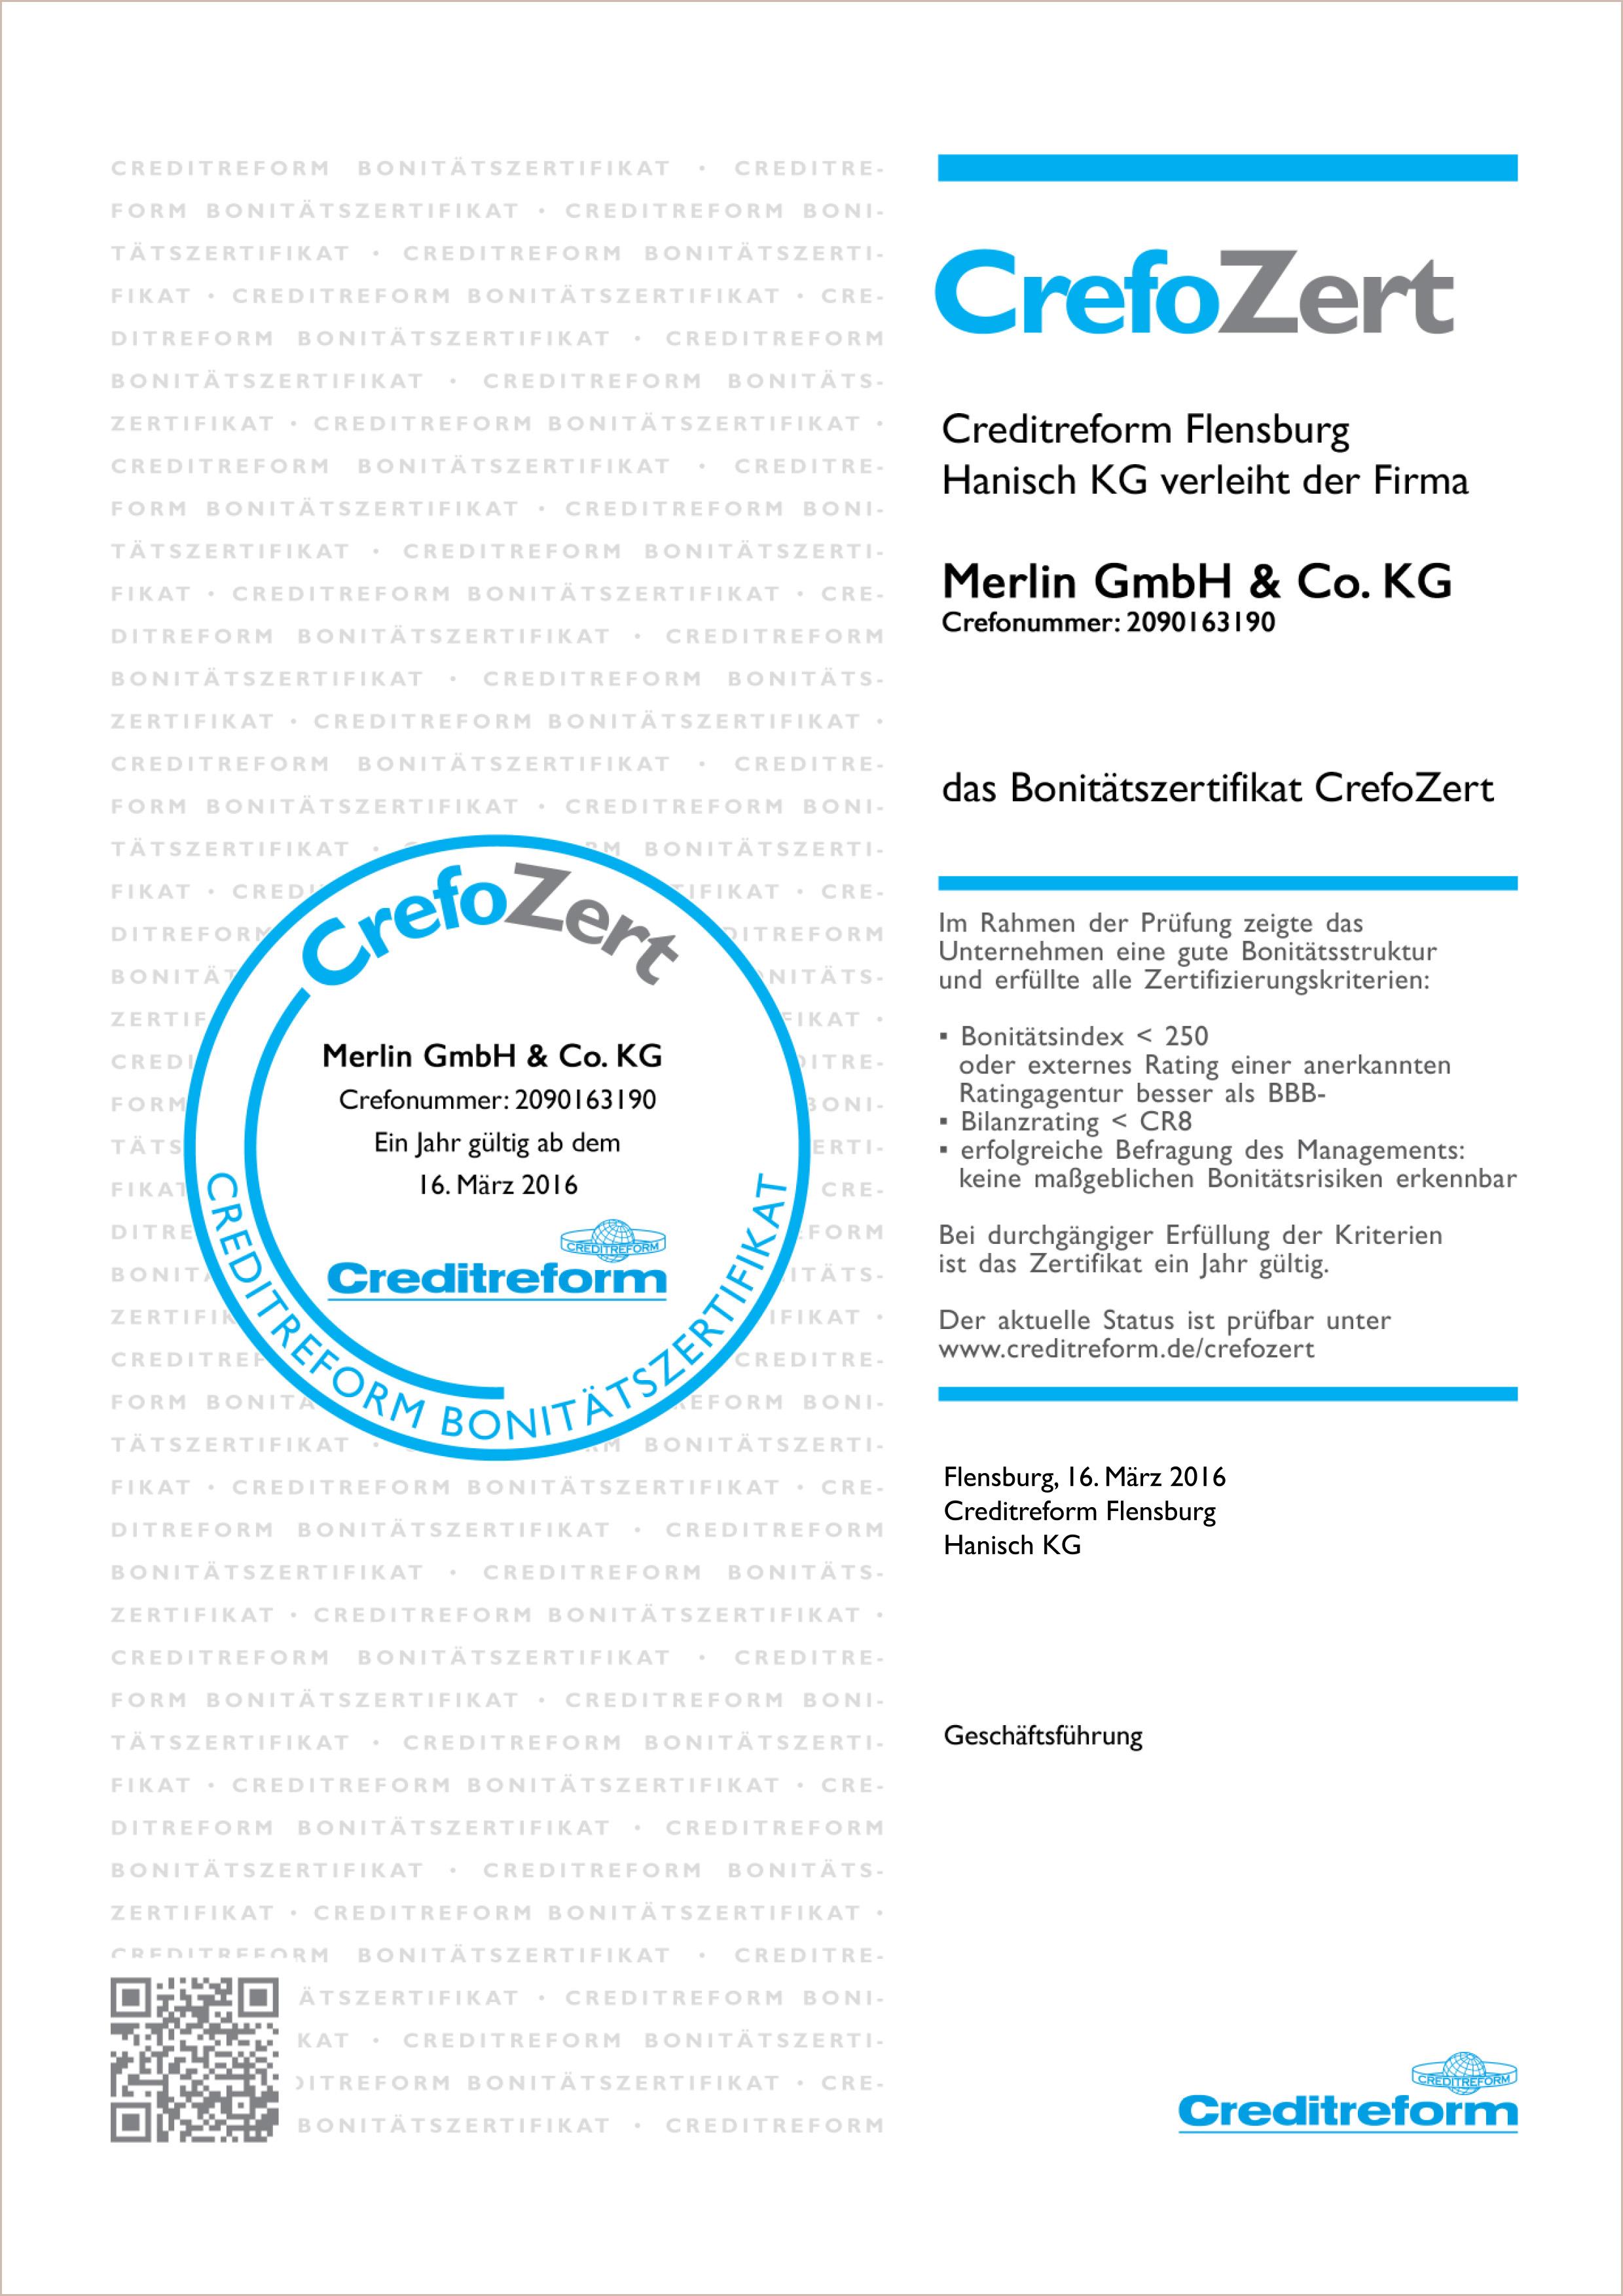 CrefoZert_Merlin-Gmbh-Co-KG-ab-2016-03-16